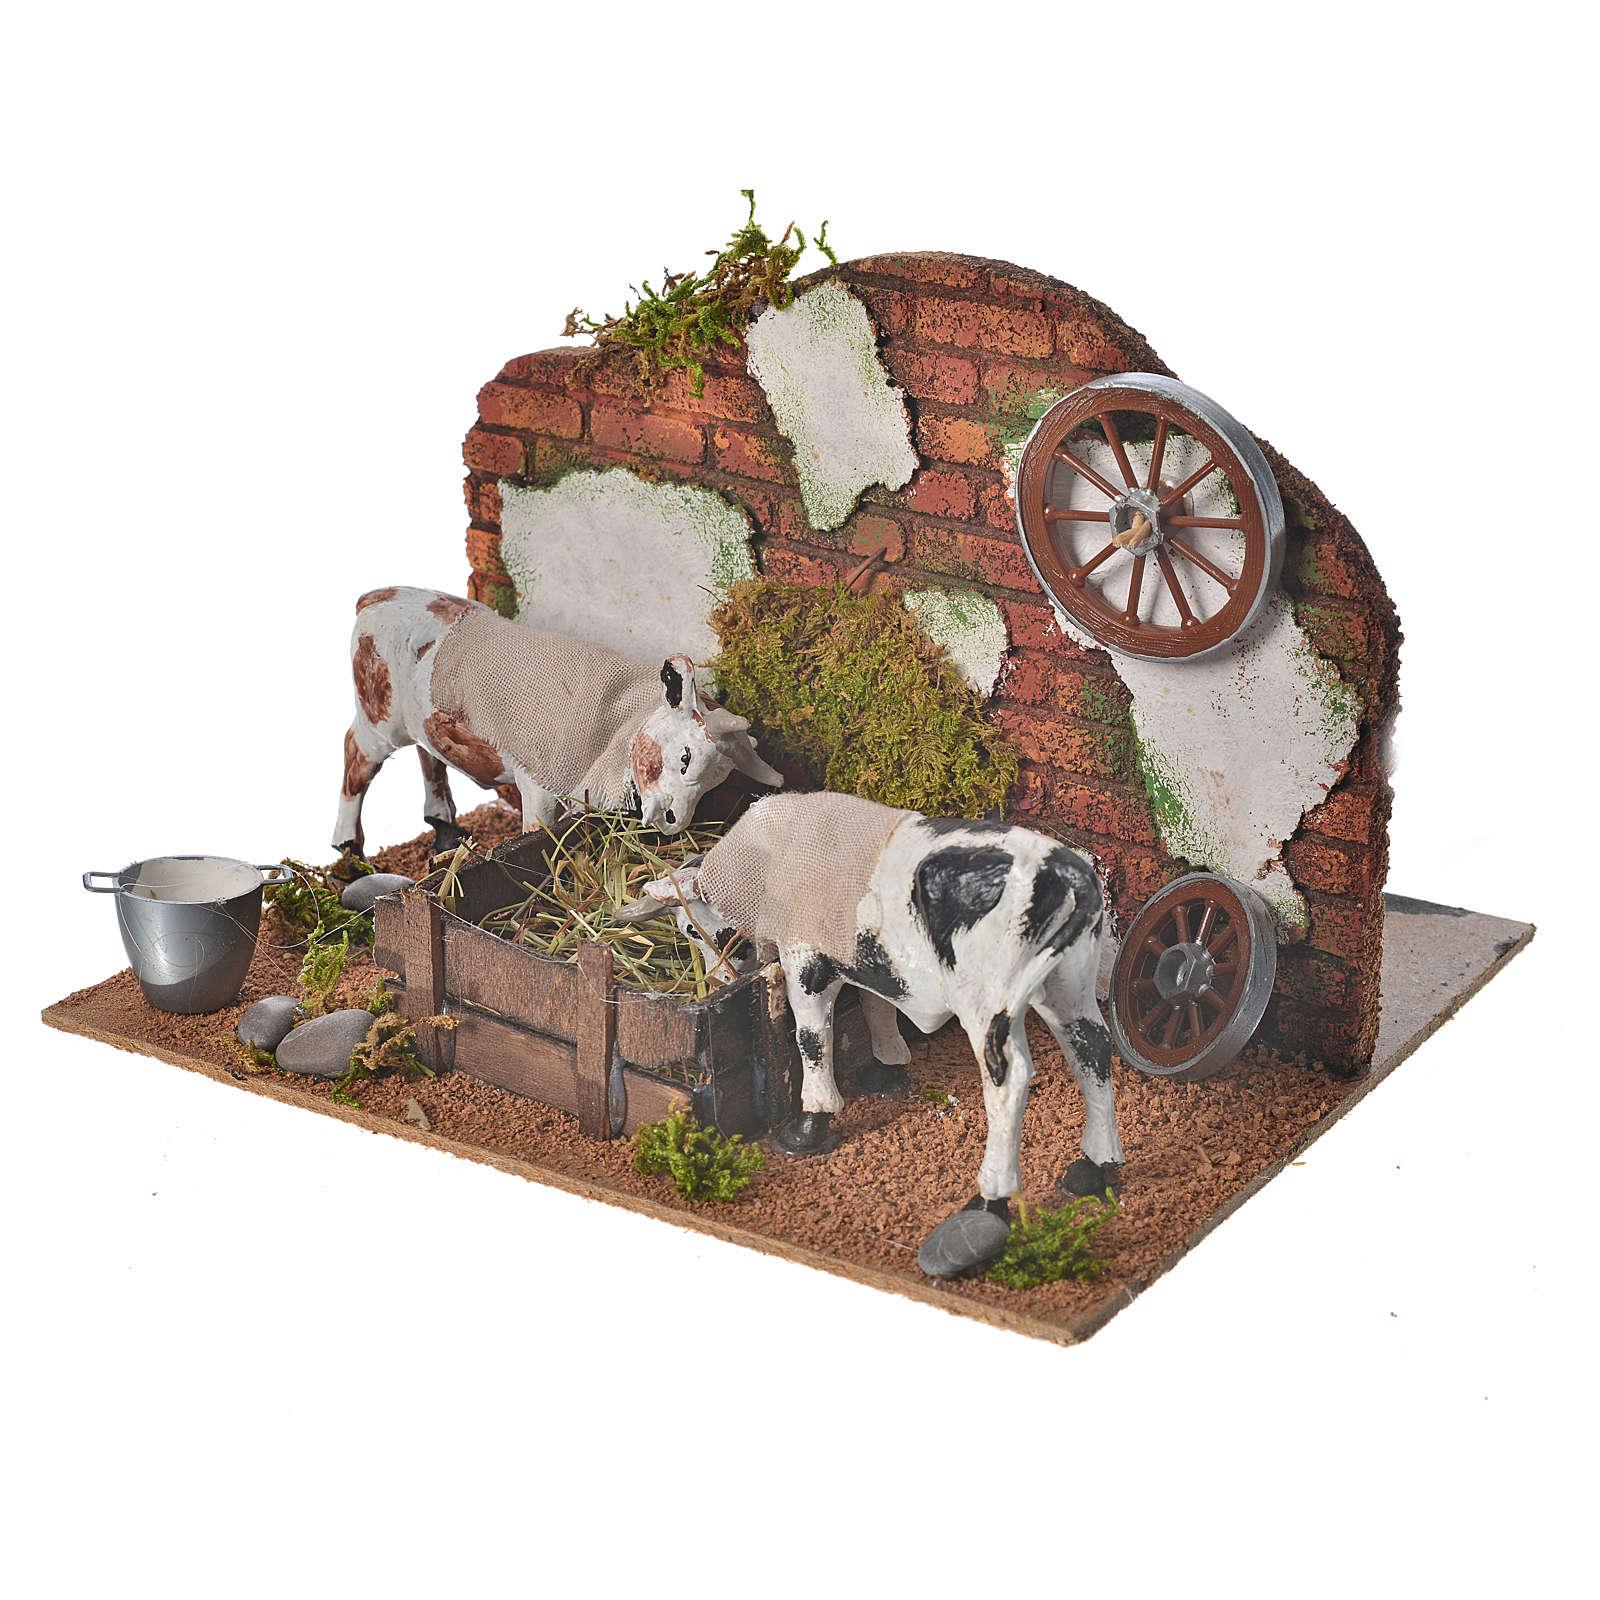 Neapolitan nativity setting, cows at the manger 10cm 4